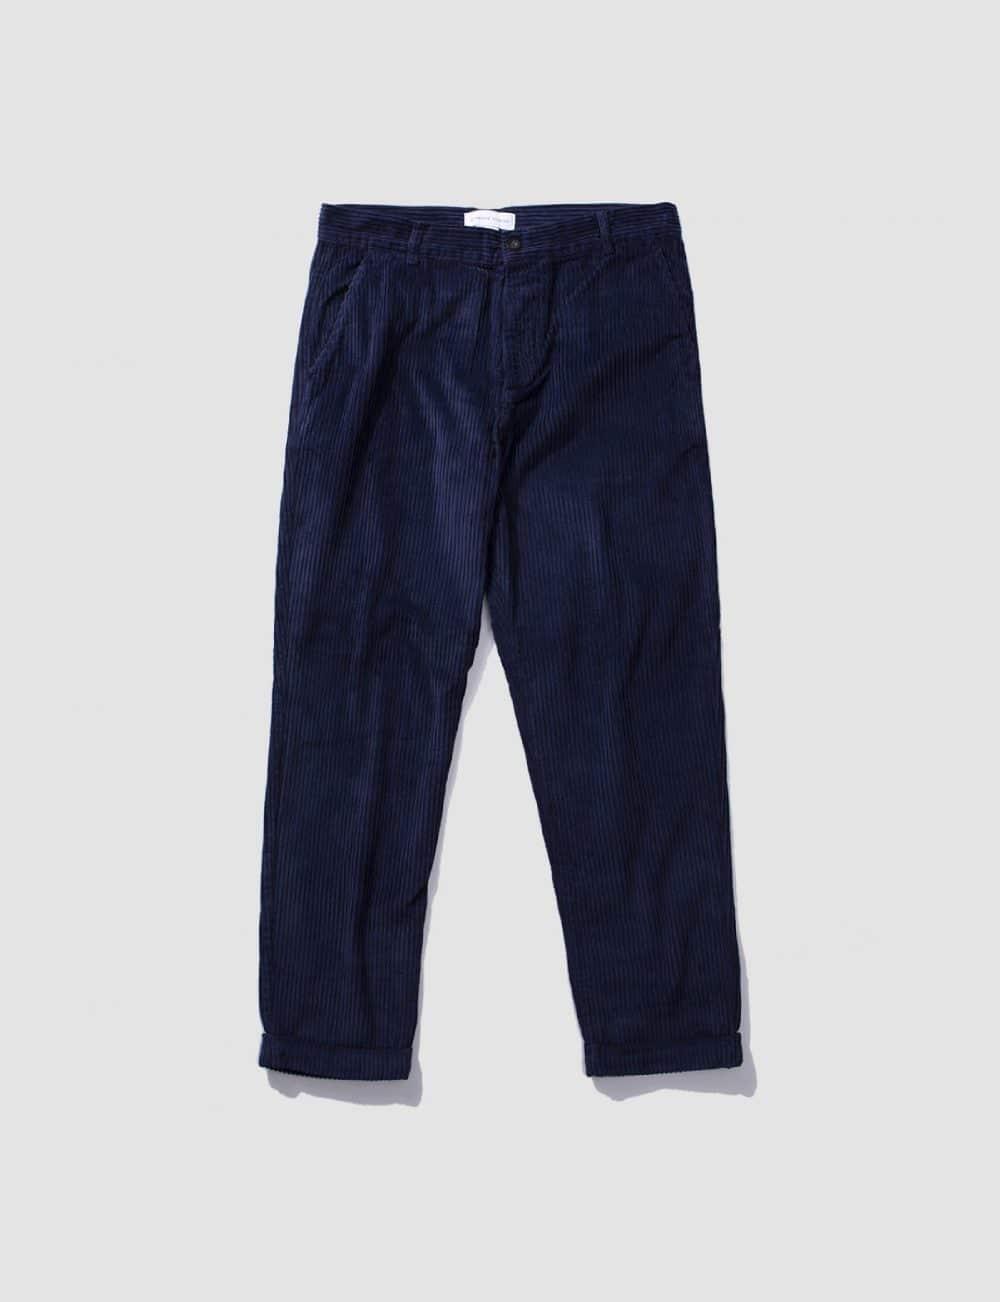 Castart - Edmmond - Jorge pants - Blue